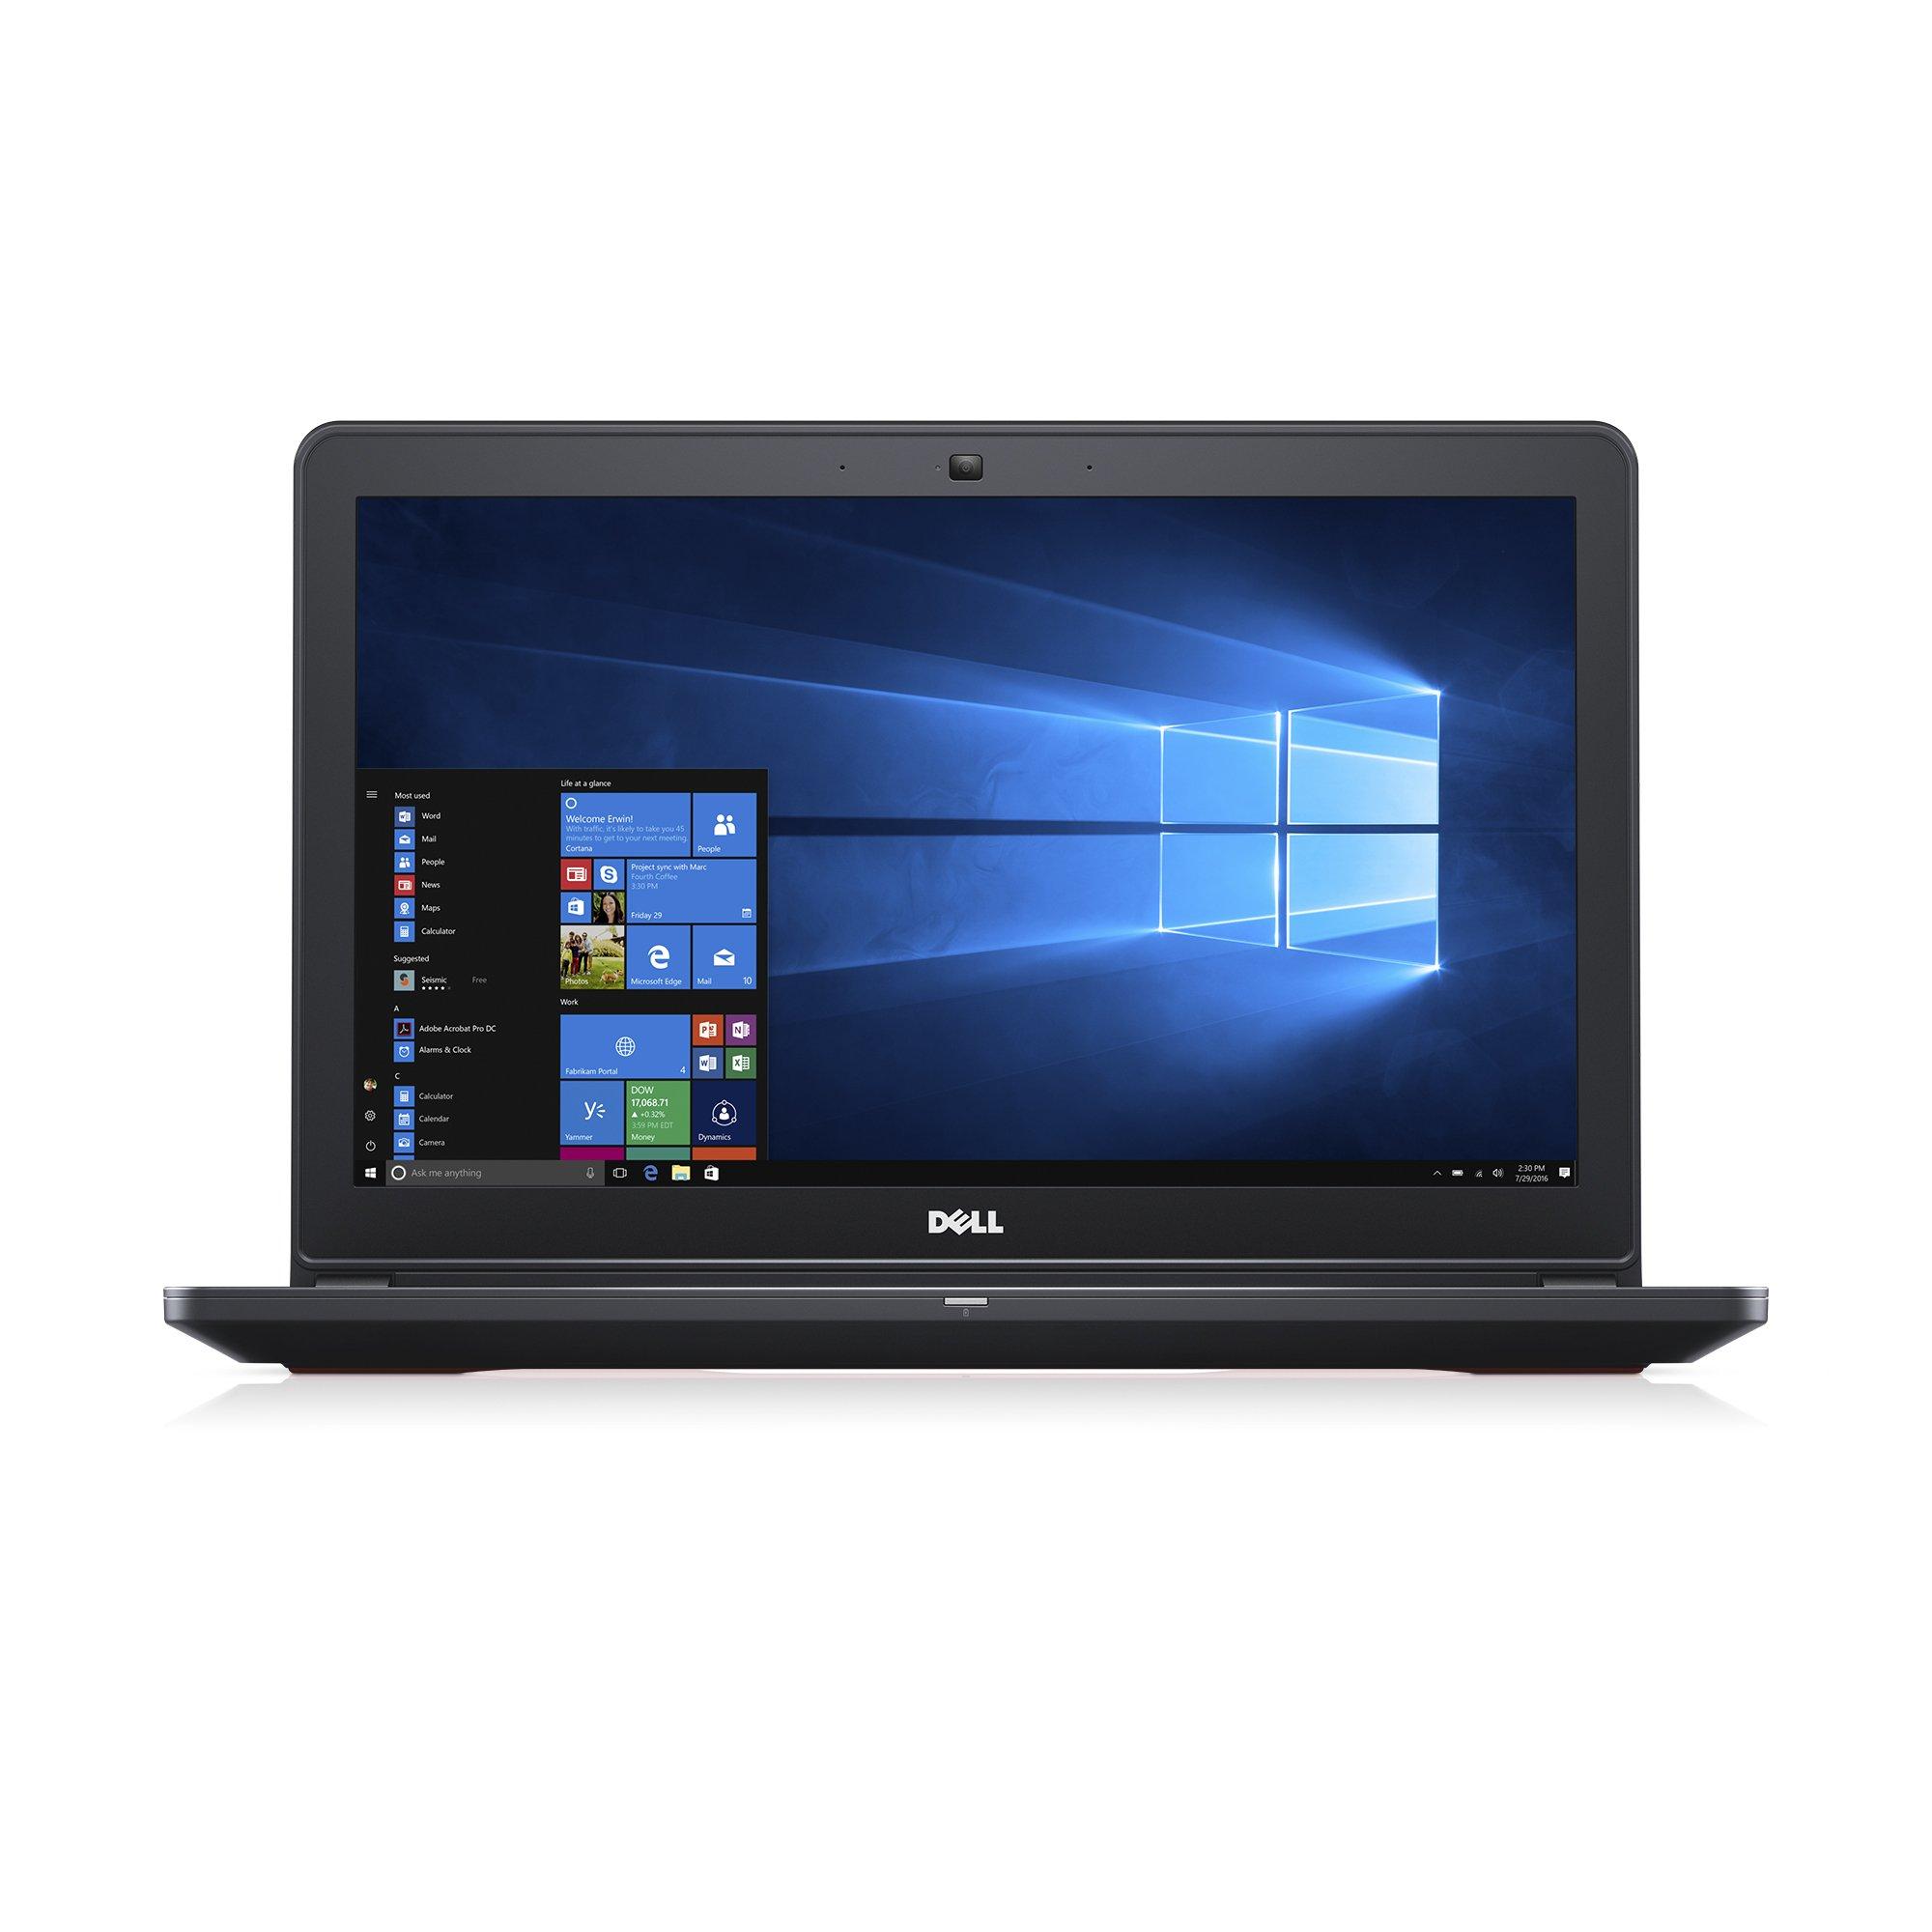 Dell Inspiron Gaming Laptop - 15.6'' Full HD, Core i7- 7700HQ, 8 GB RAM, 1000 GB HDD + 128GB SSD, GTX 1050, Metal Chassis - i5577-7359BLK-PUS